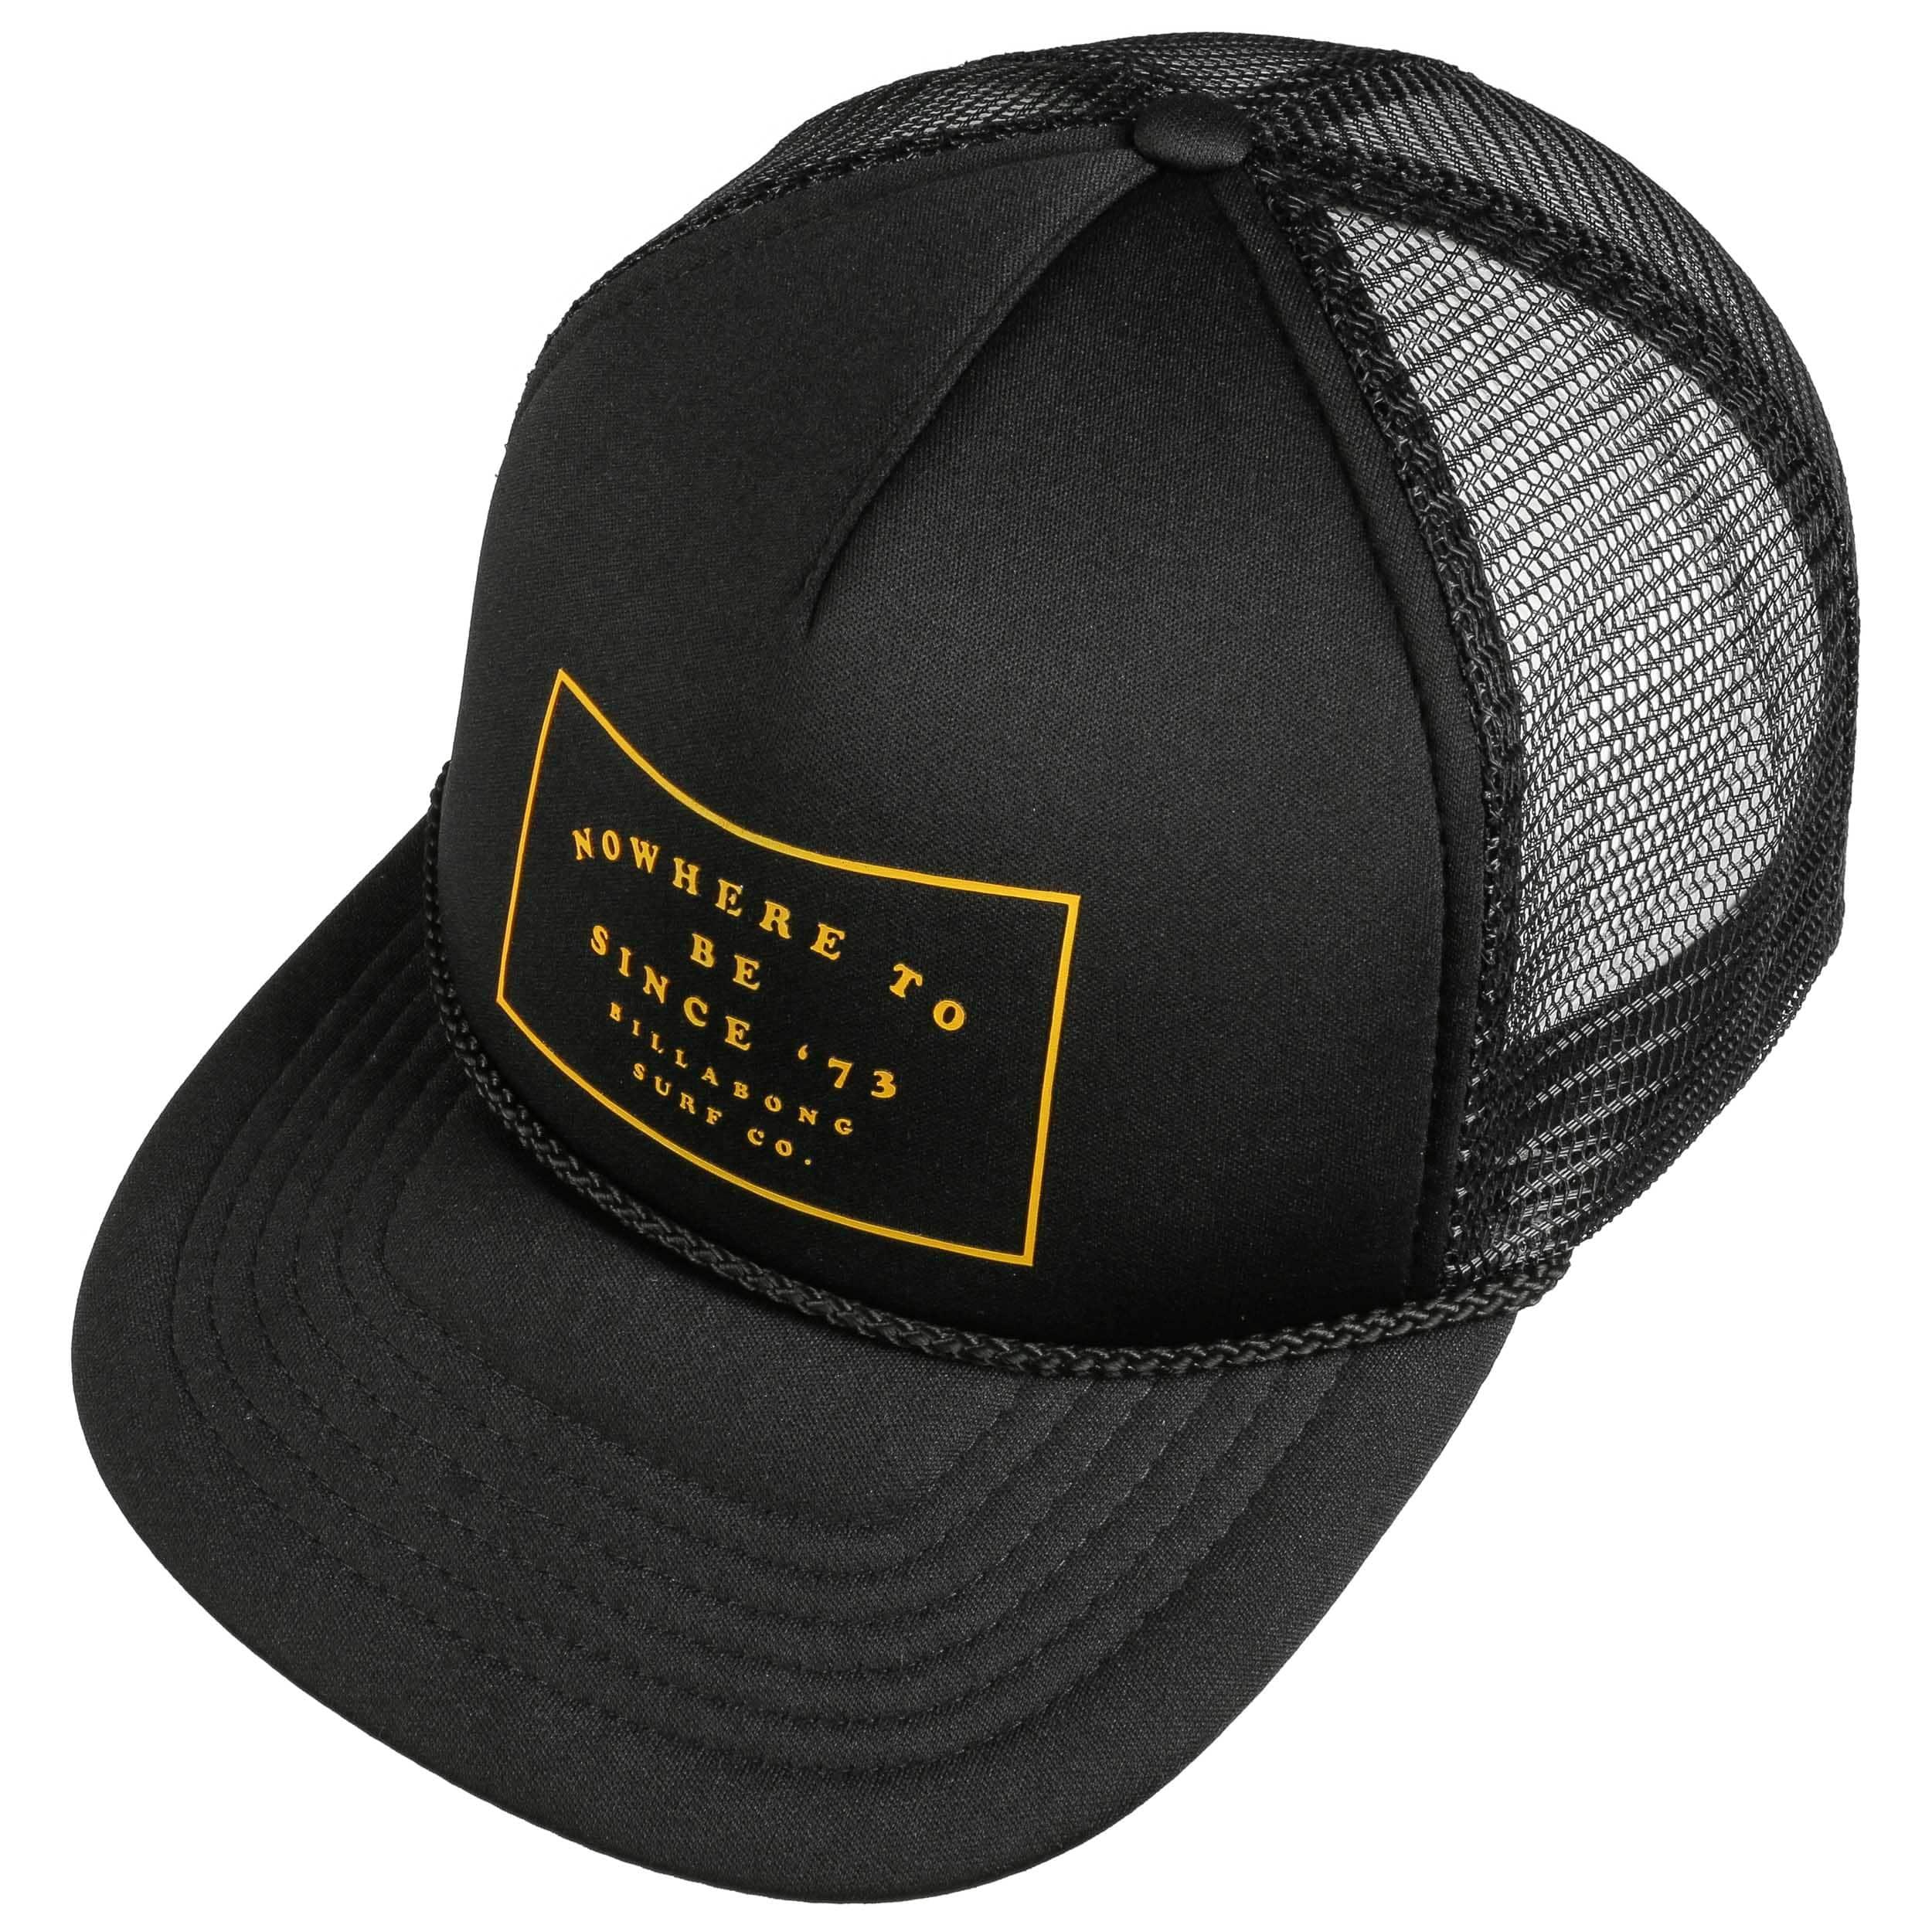 buy online 9f678 4573d ... Upgrade Trucker Cap by Billabong - black 1 ...